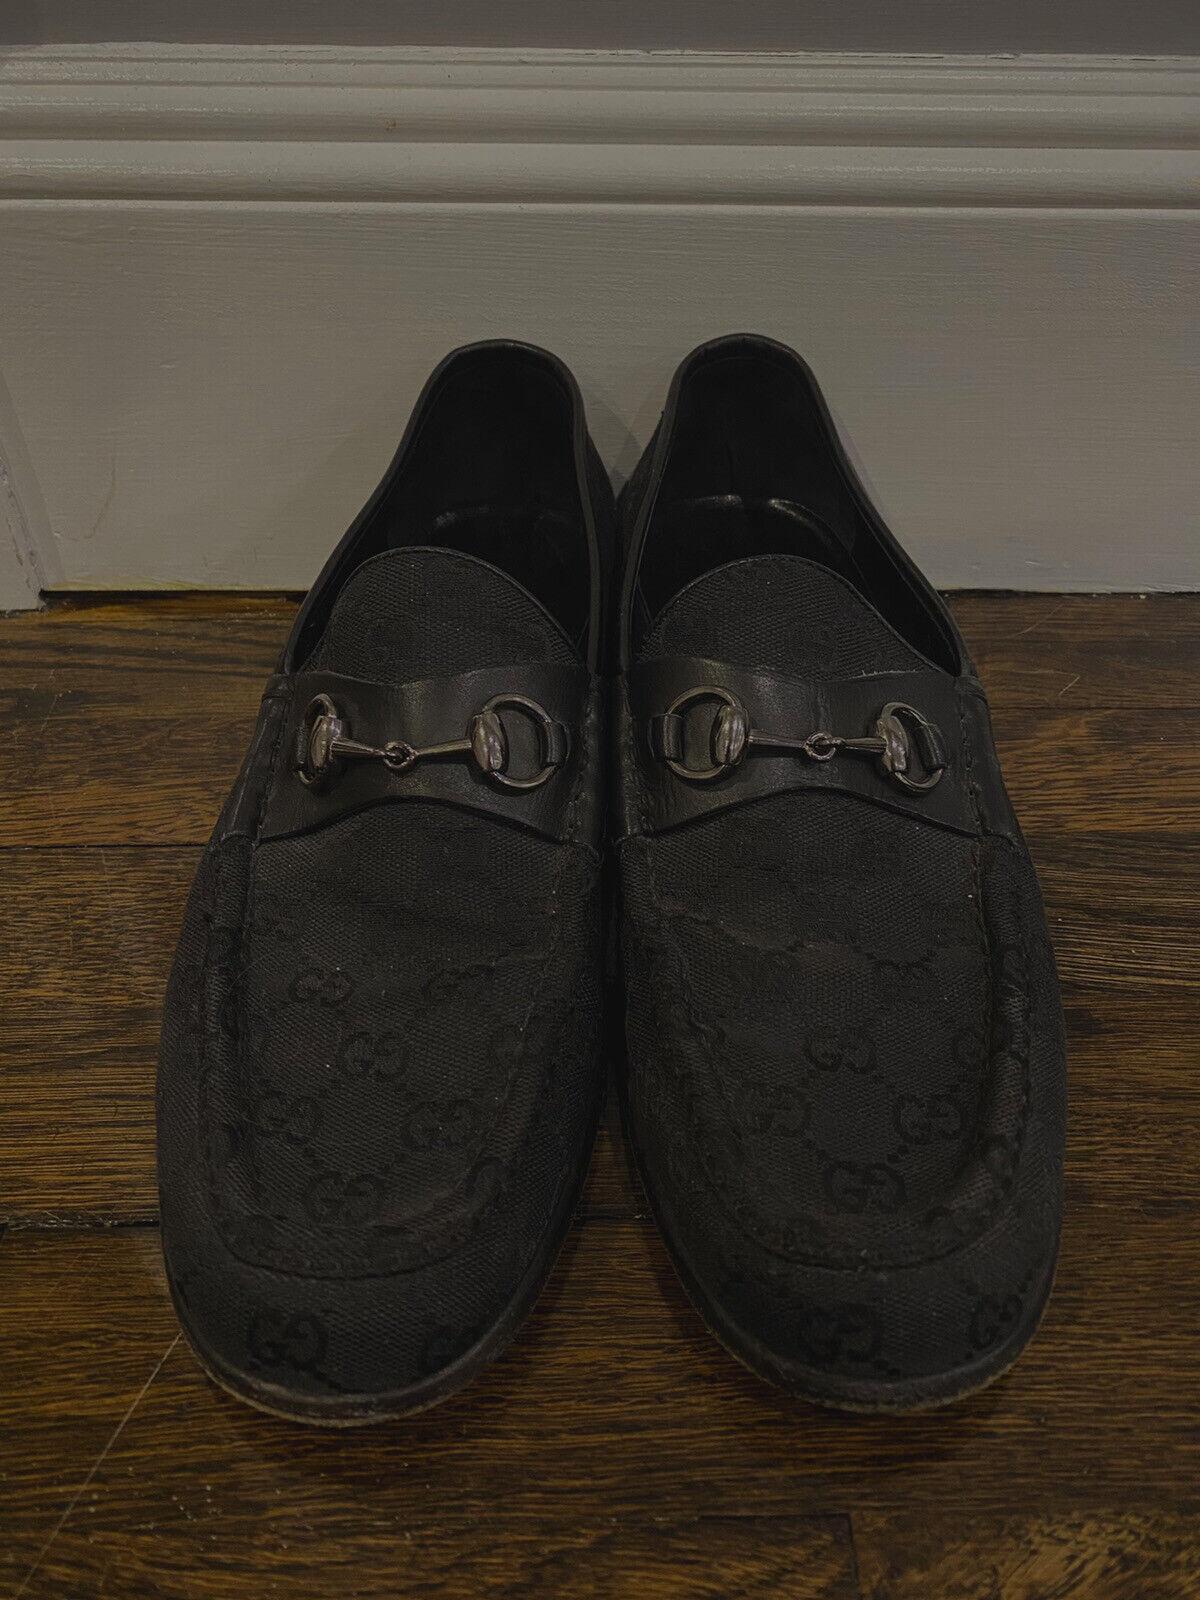 Gucci Loafers Vintage Mens Black Horsebit Classic… - image 1